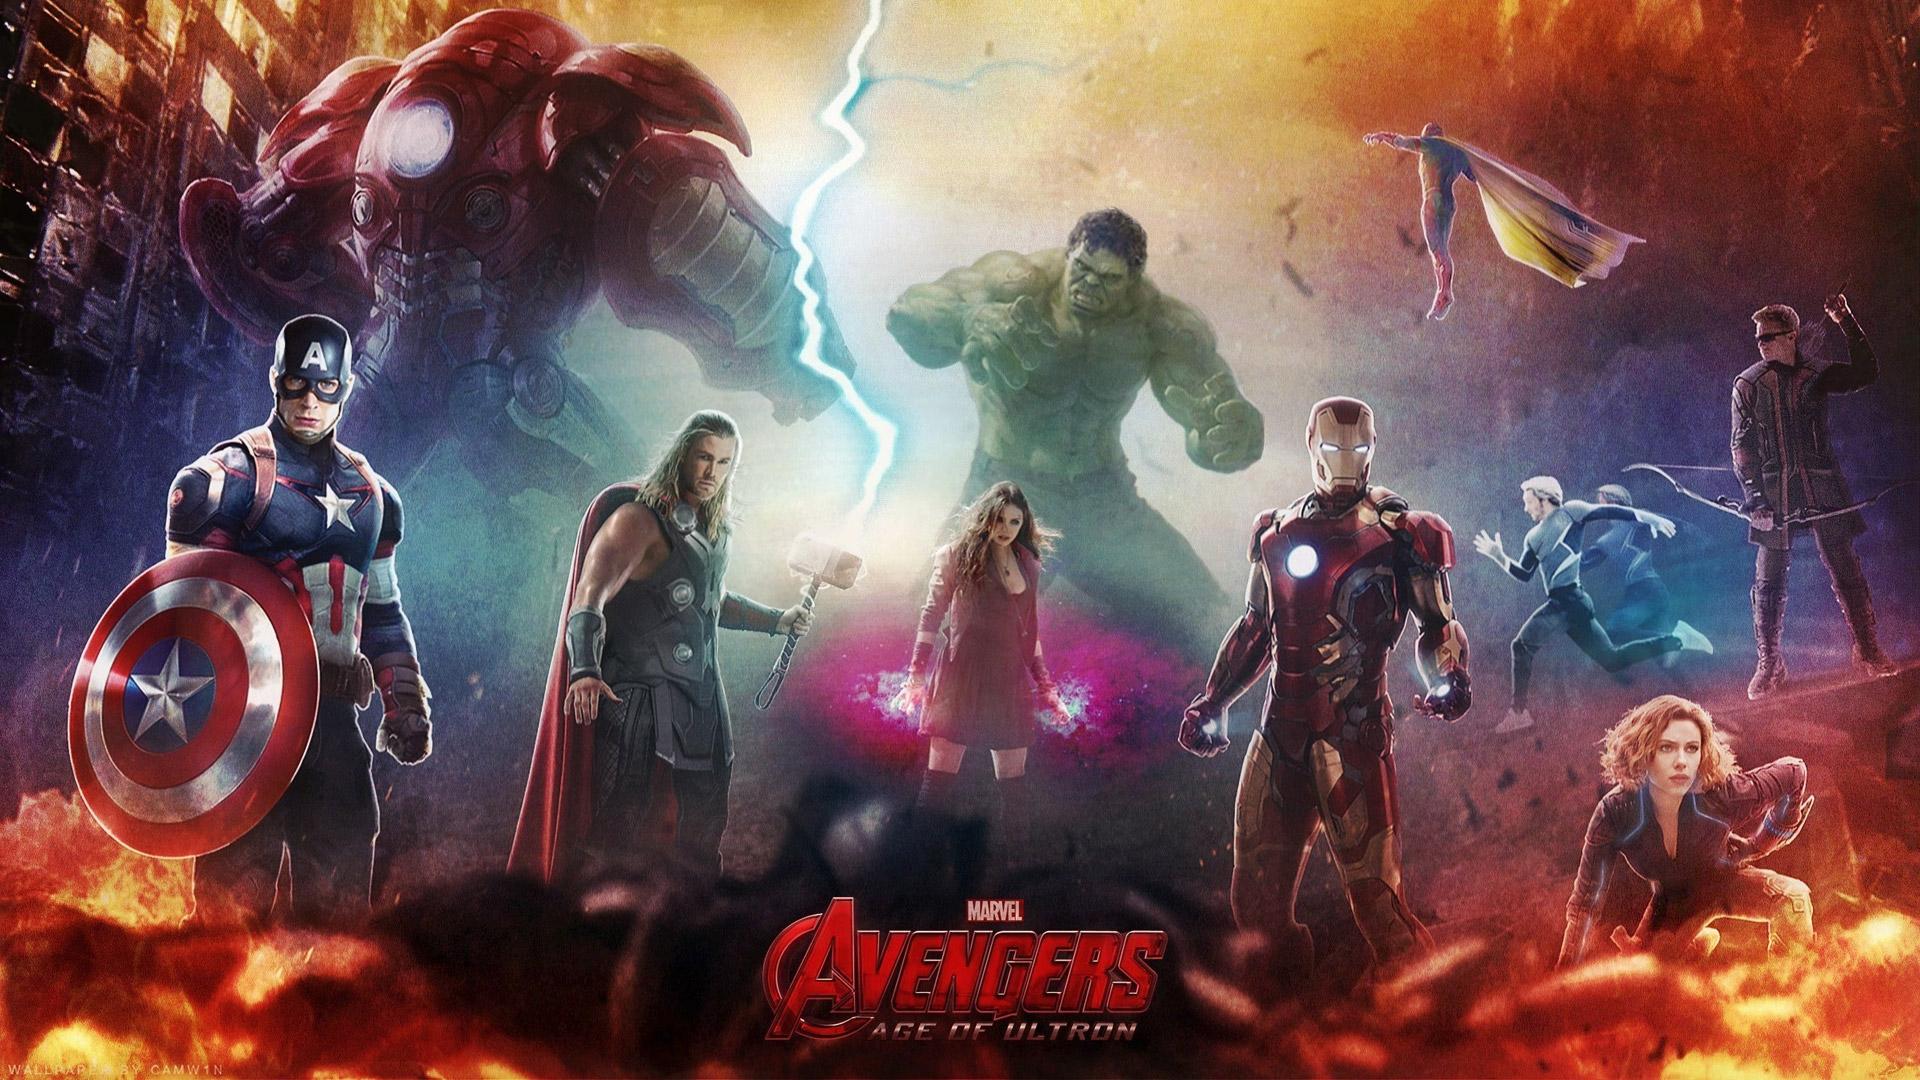 Avengers Age of Ultron wallpaper 8